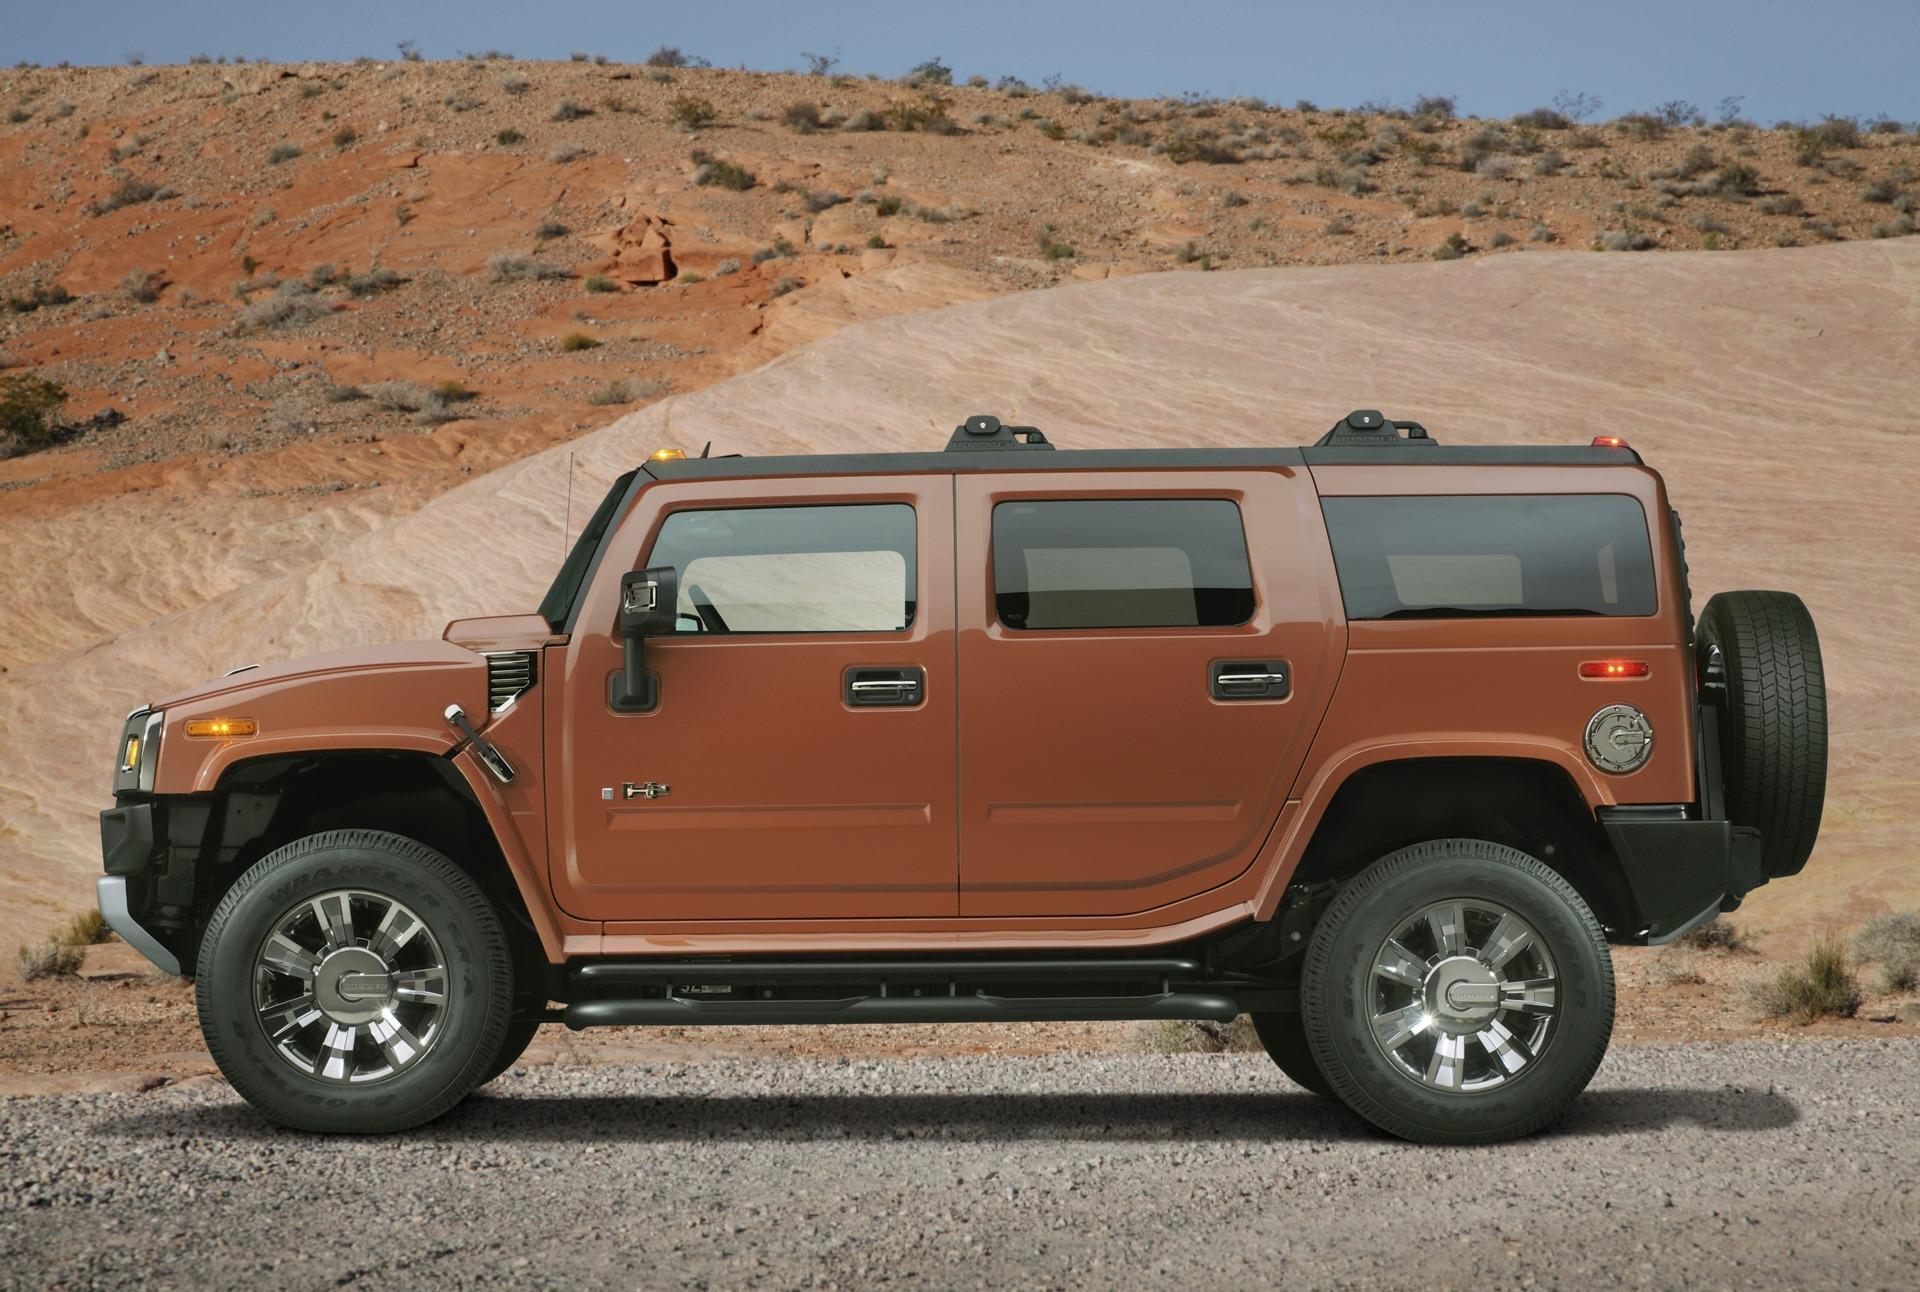 2009 Hummer H2 conceptcarz